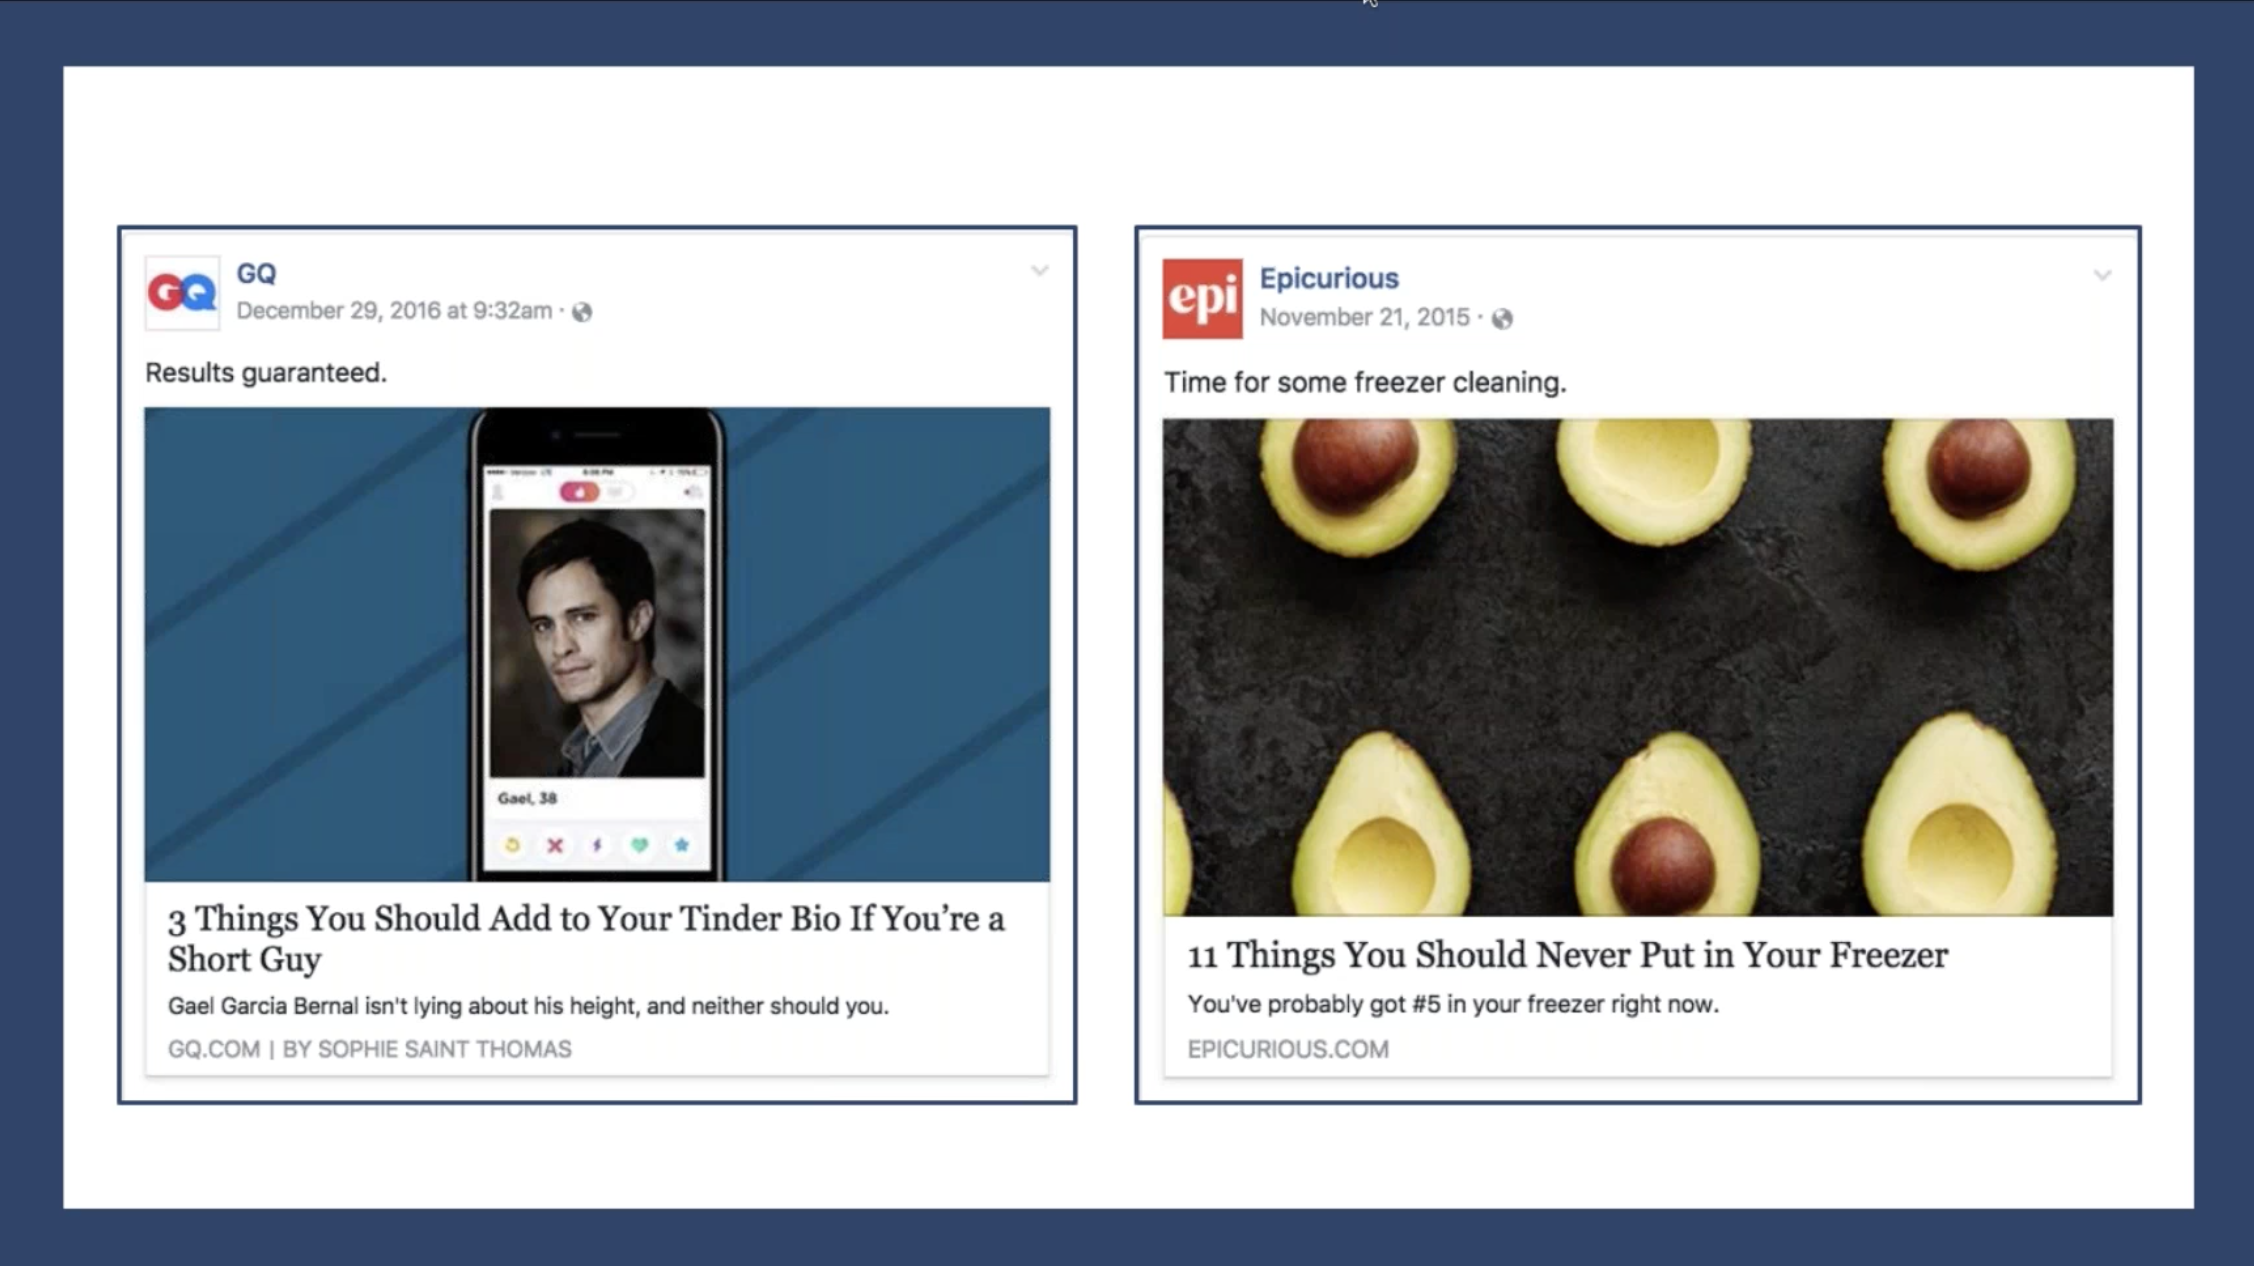 High Converting Facebook Posts